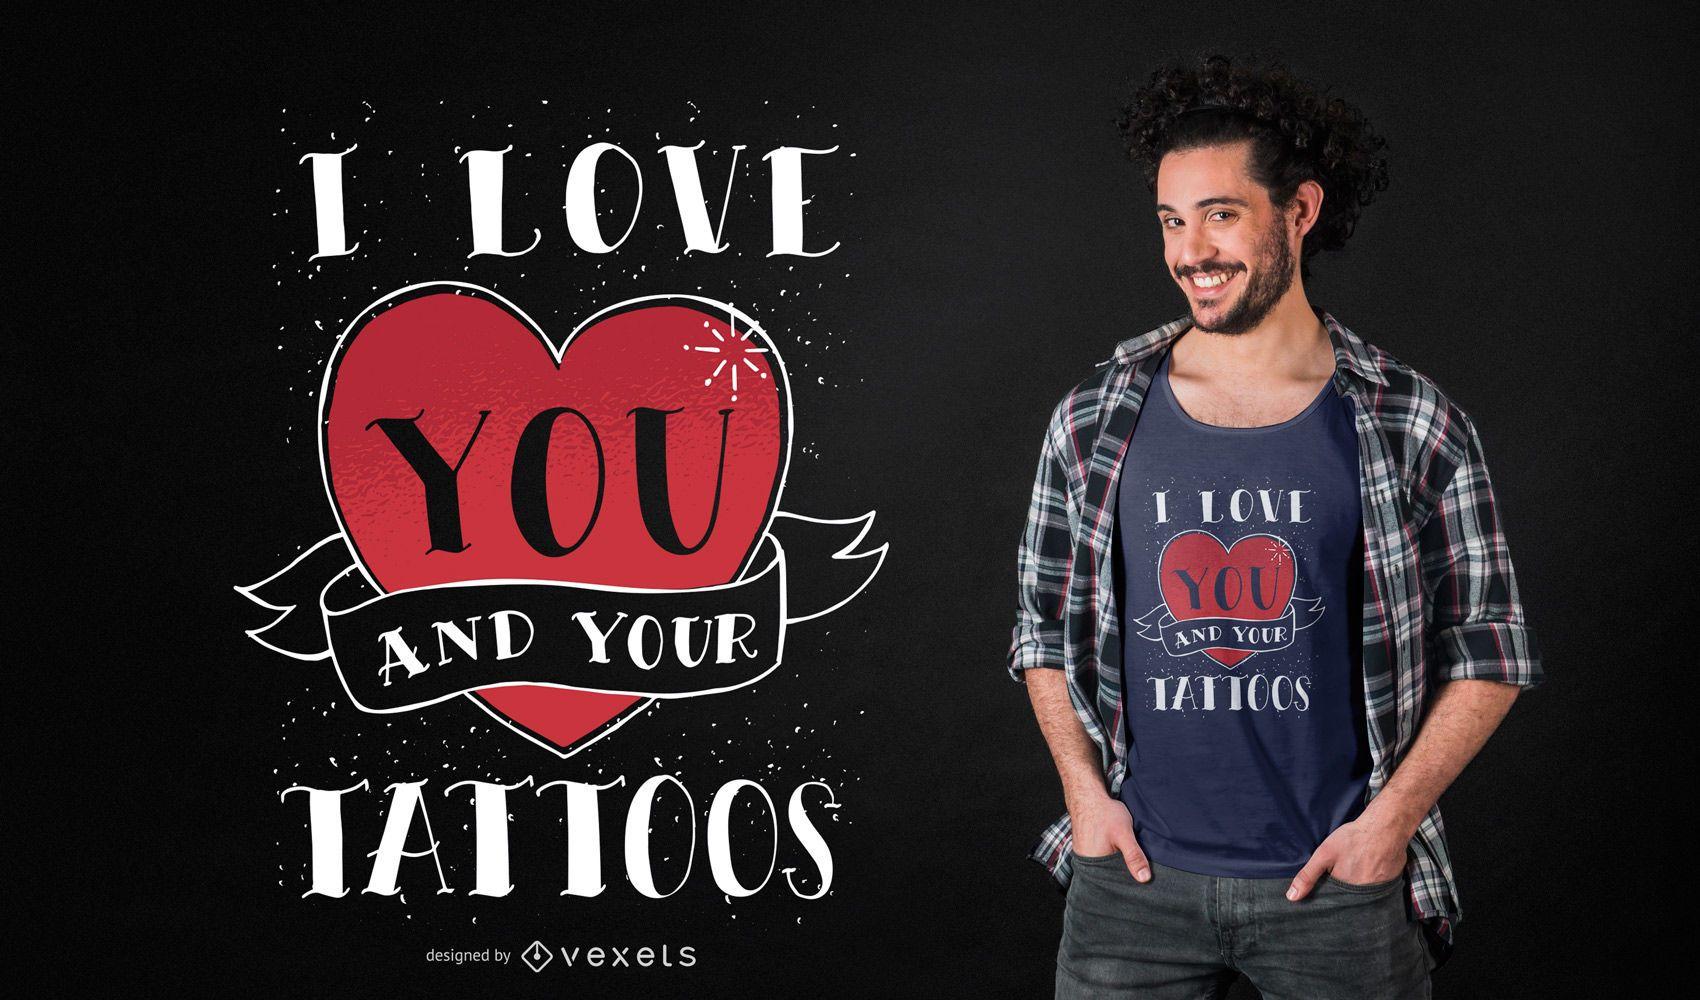 I love your tattoos t-shirt design